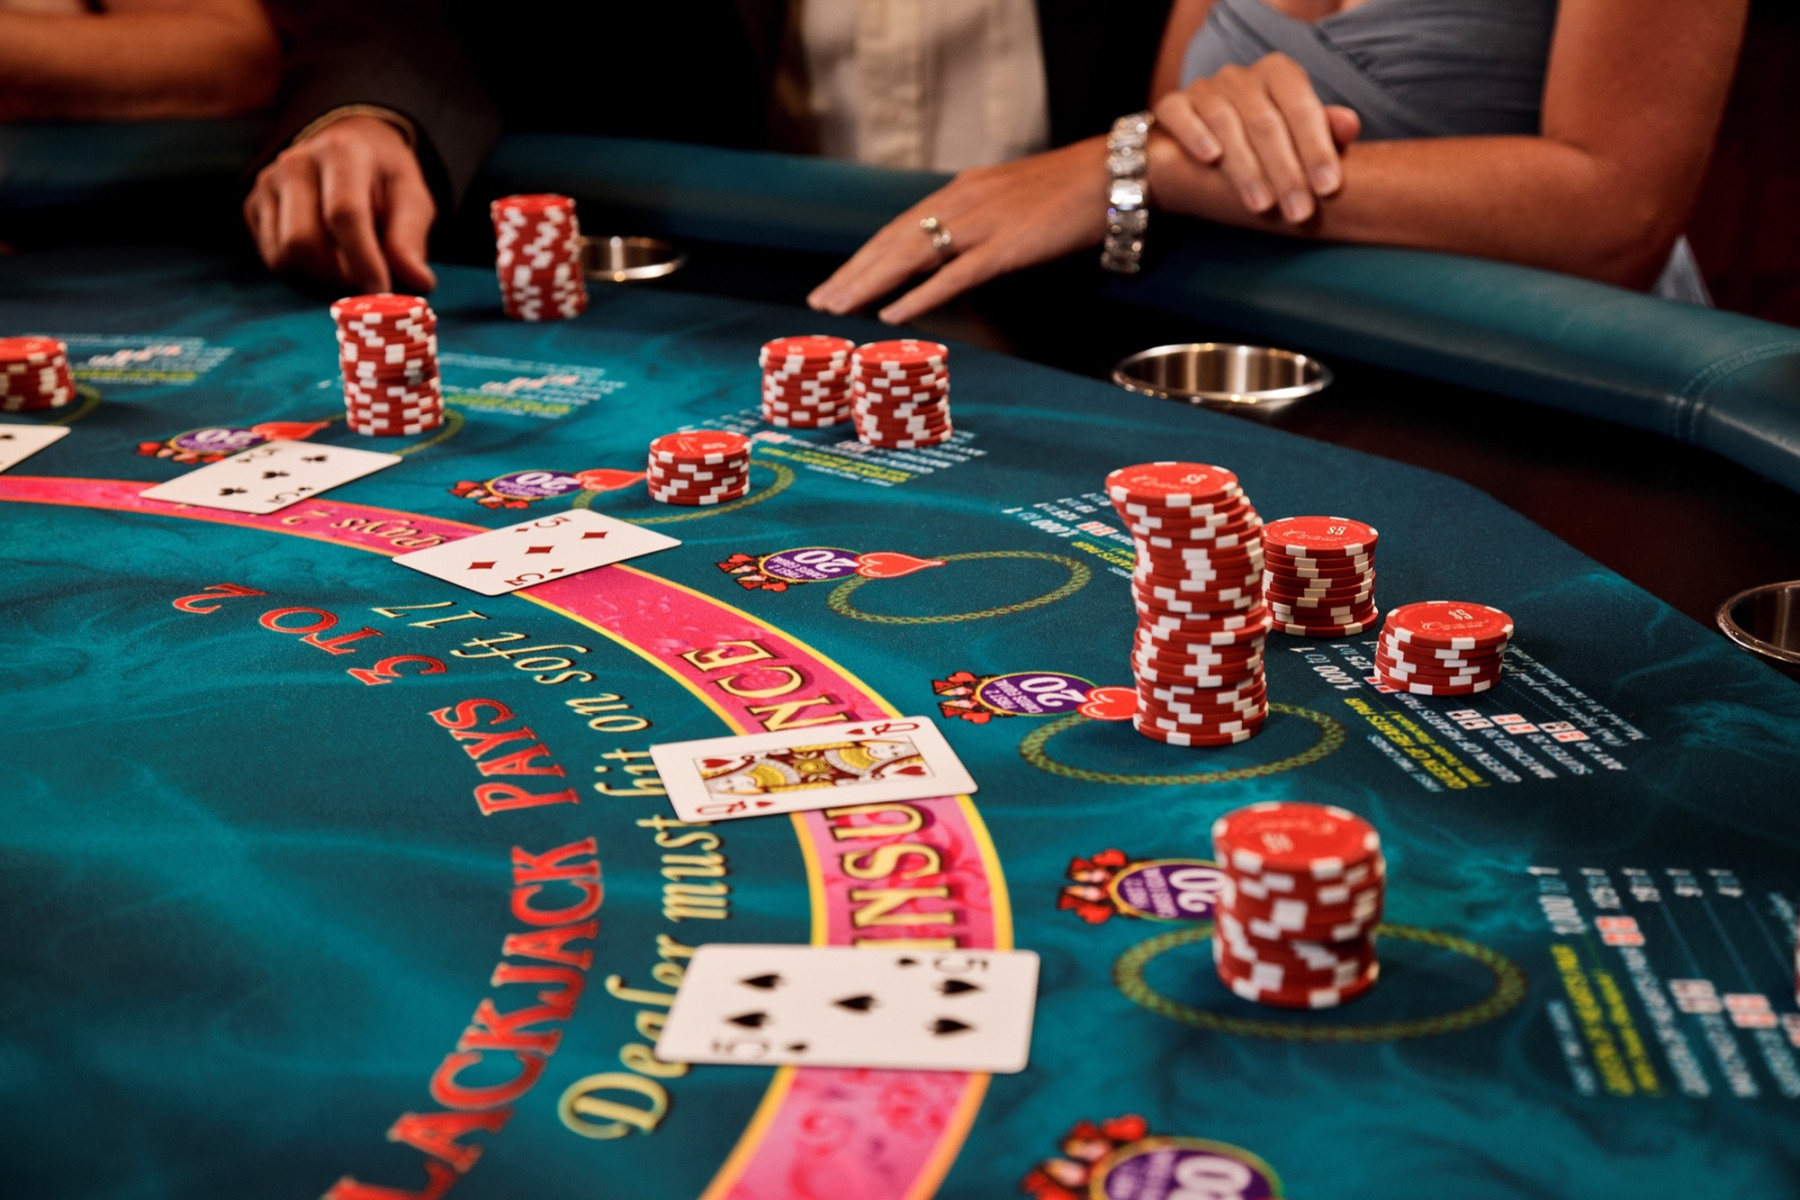 Royal Caribbean International Oasis of the Seas Casino 2.jpg